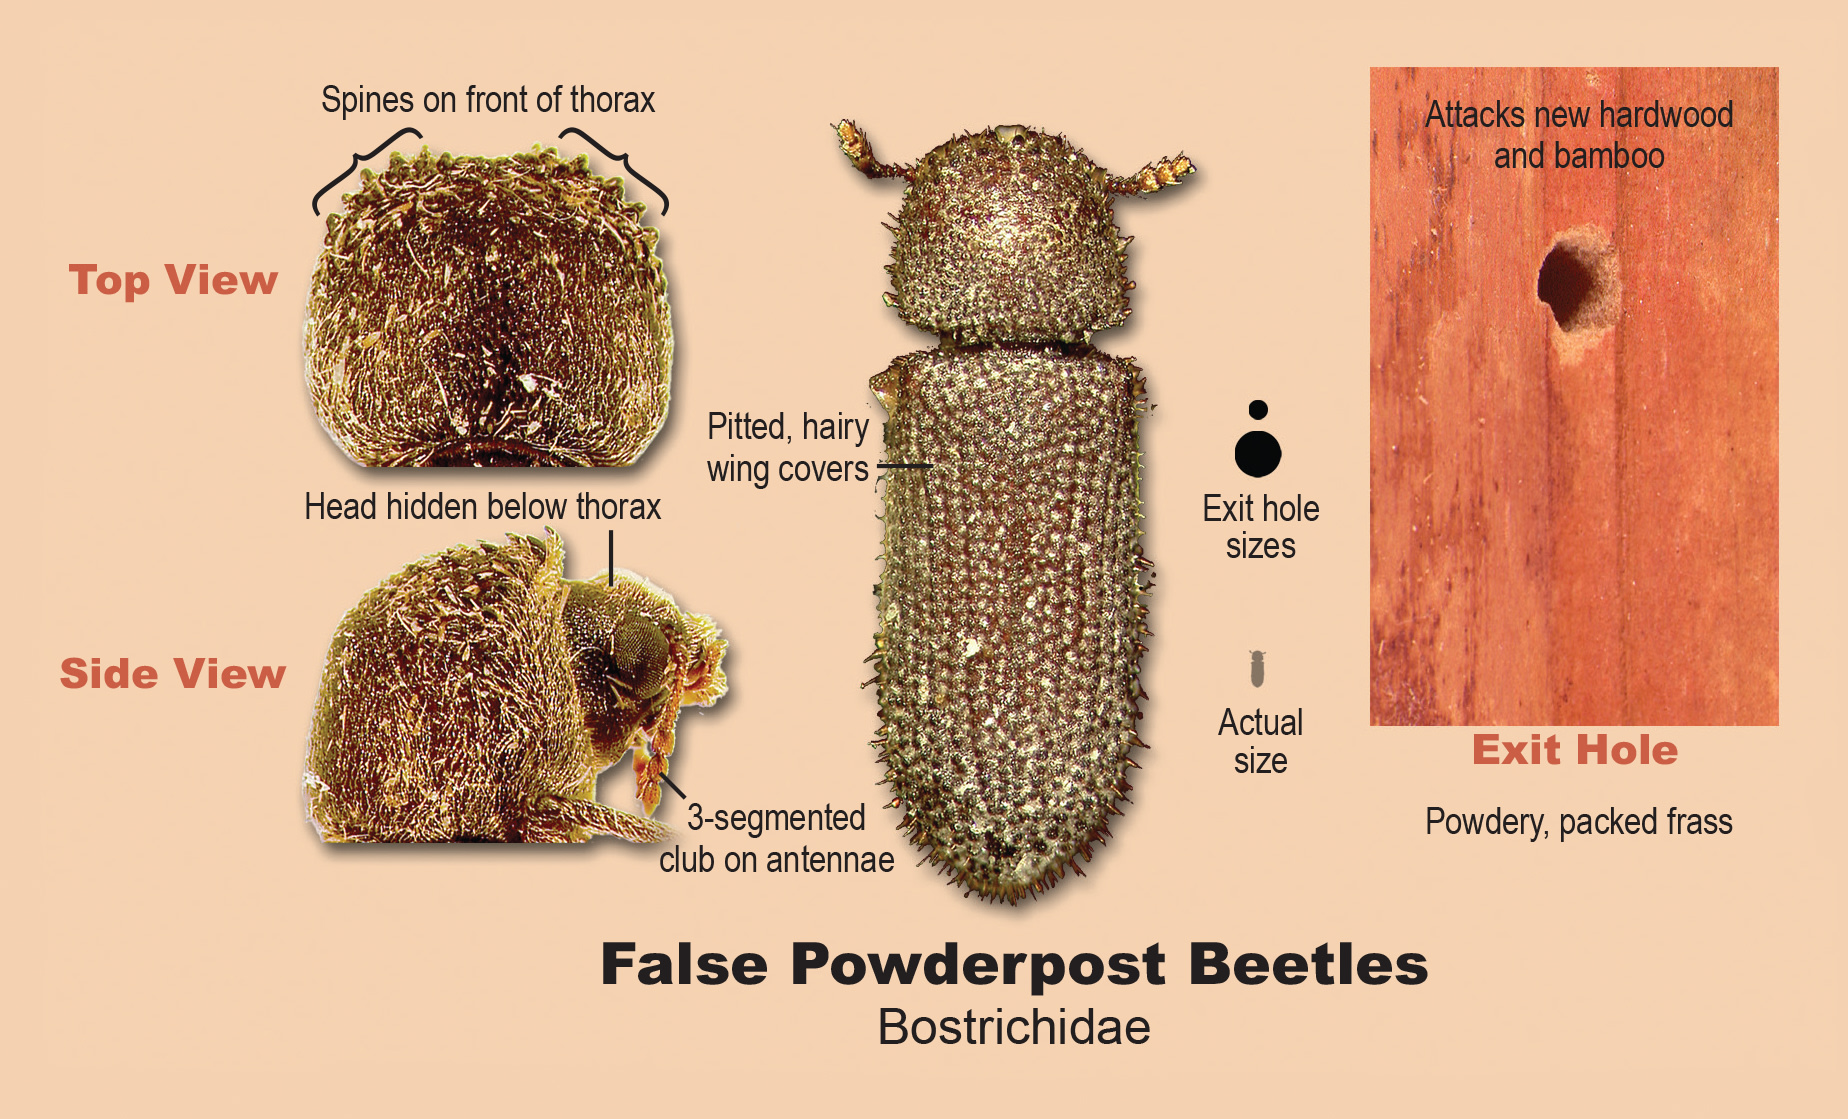 False powderpost beetles.